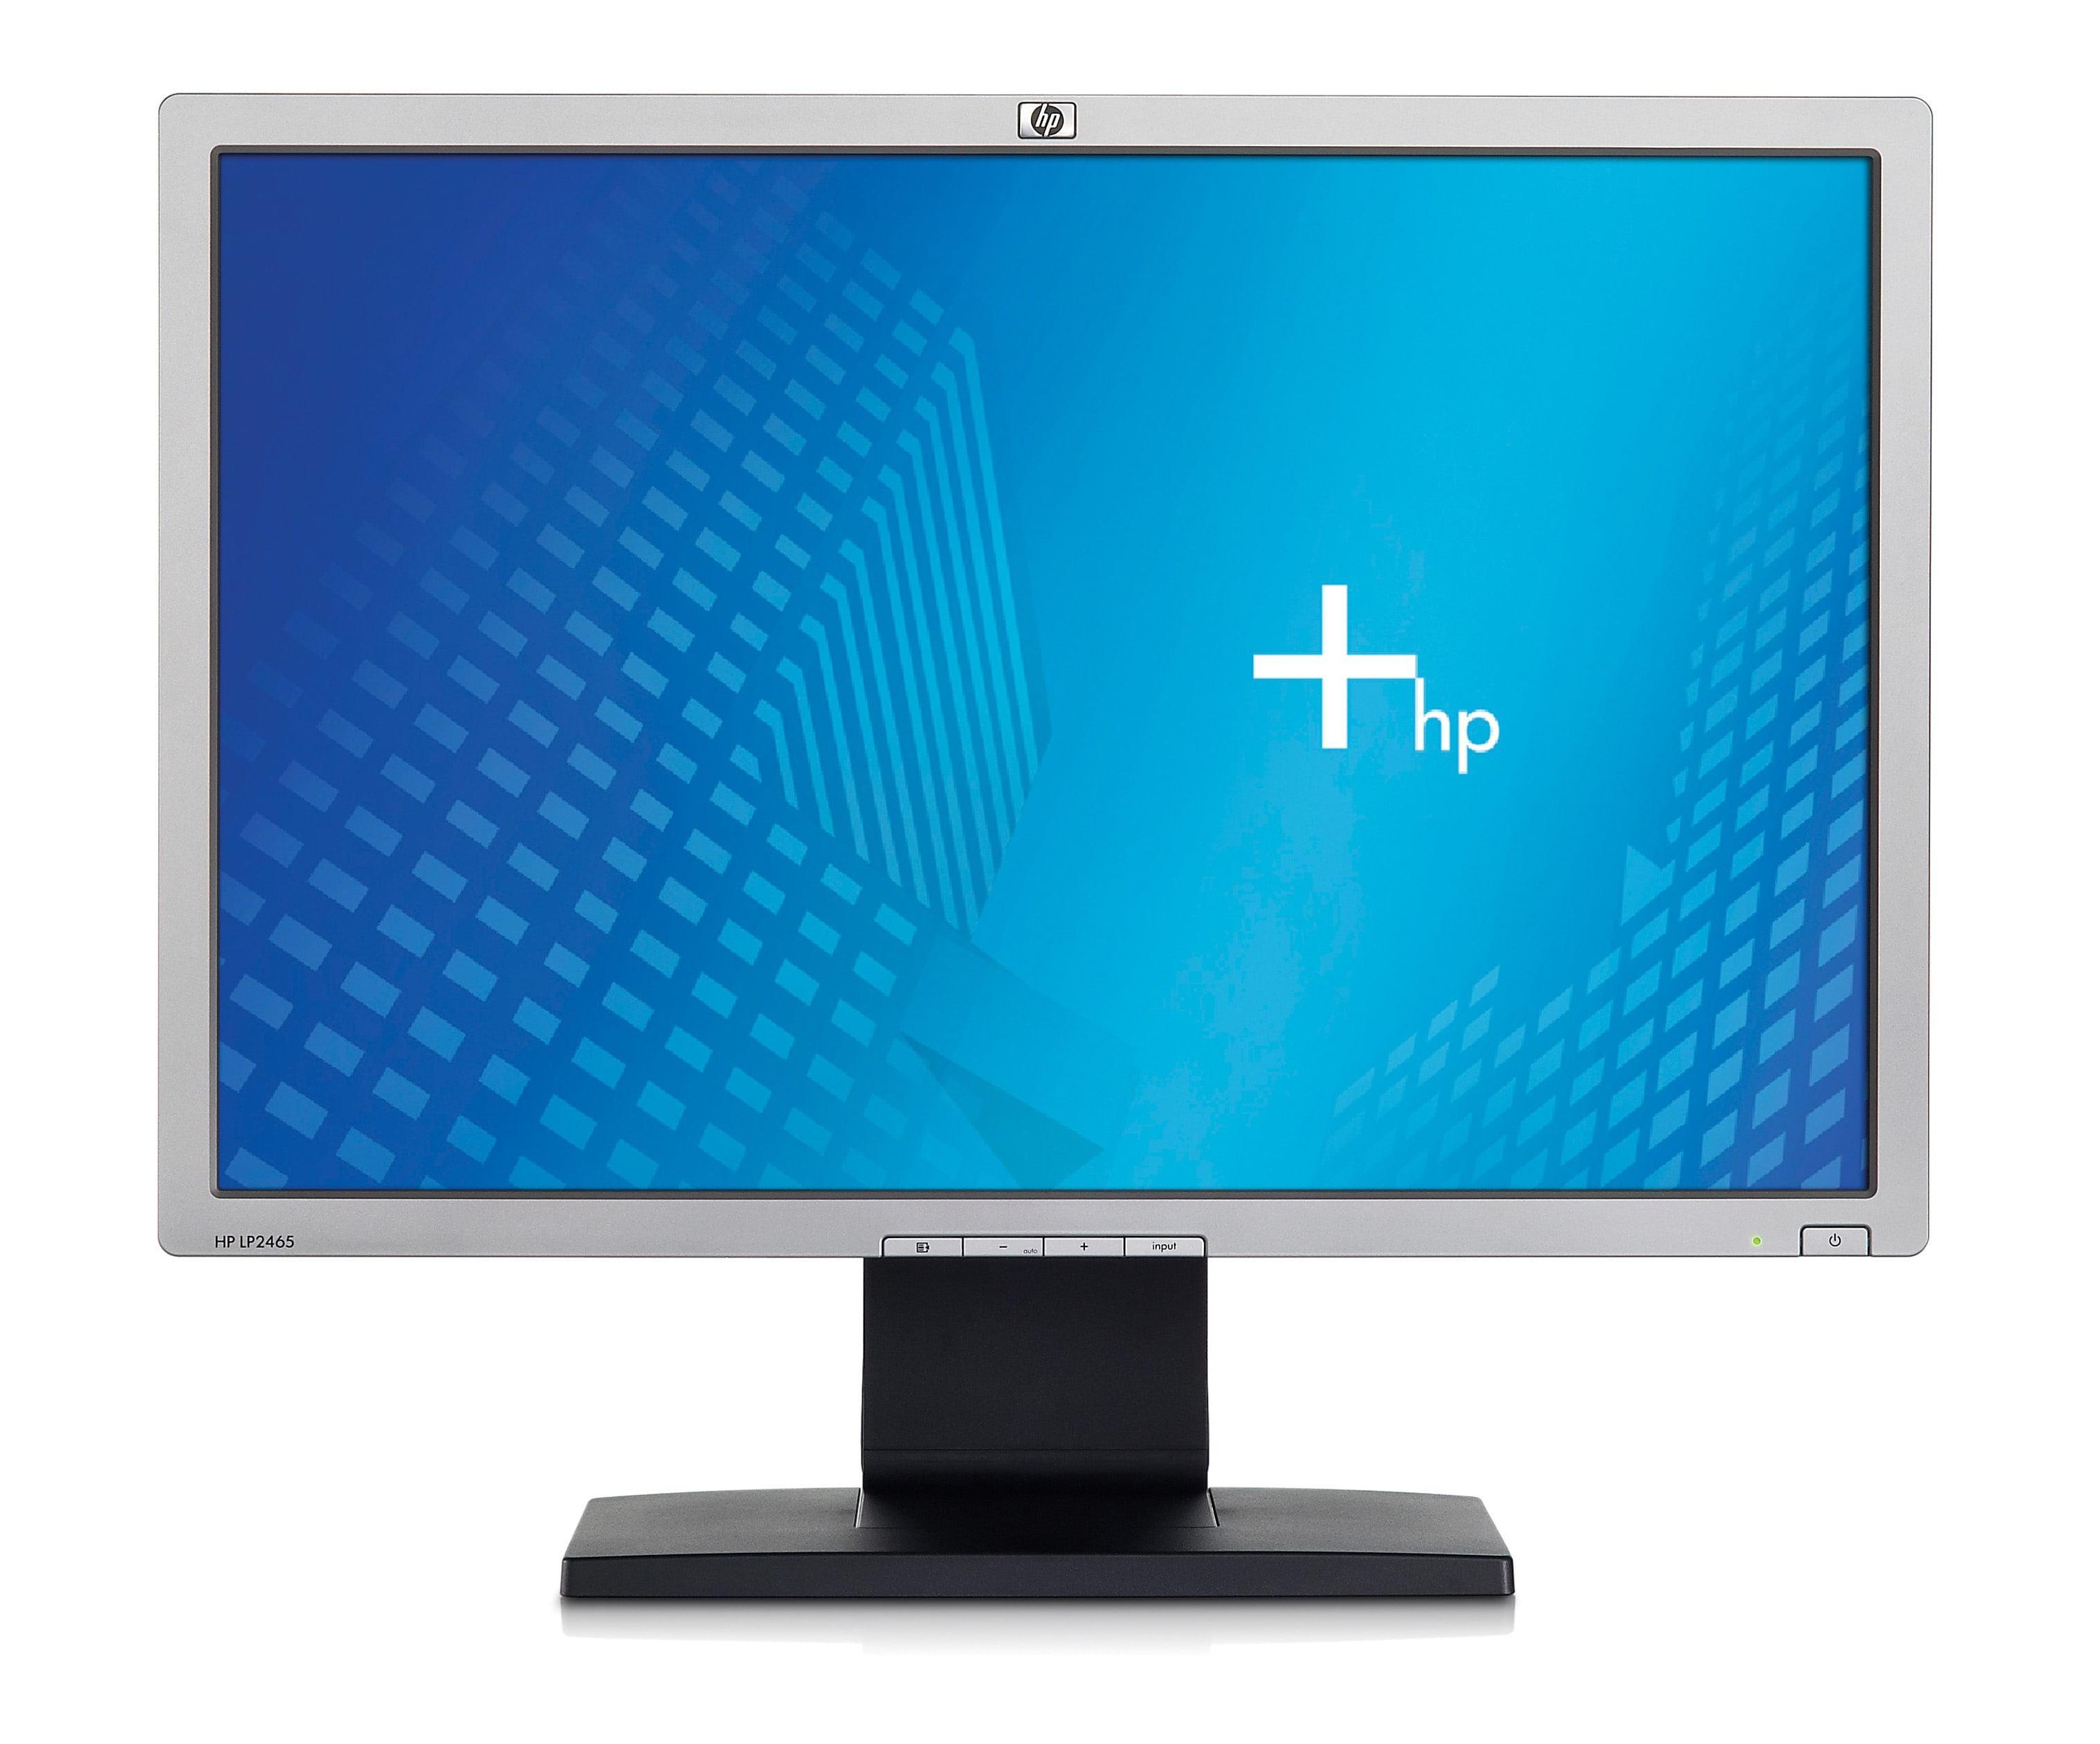 HP EF224A4 - HP LP2465 computer monitor 61 cm